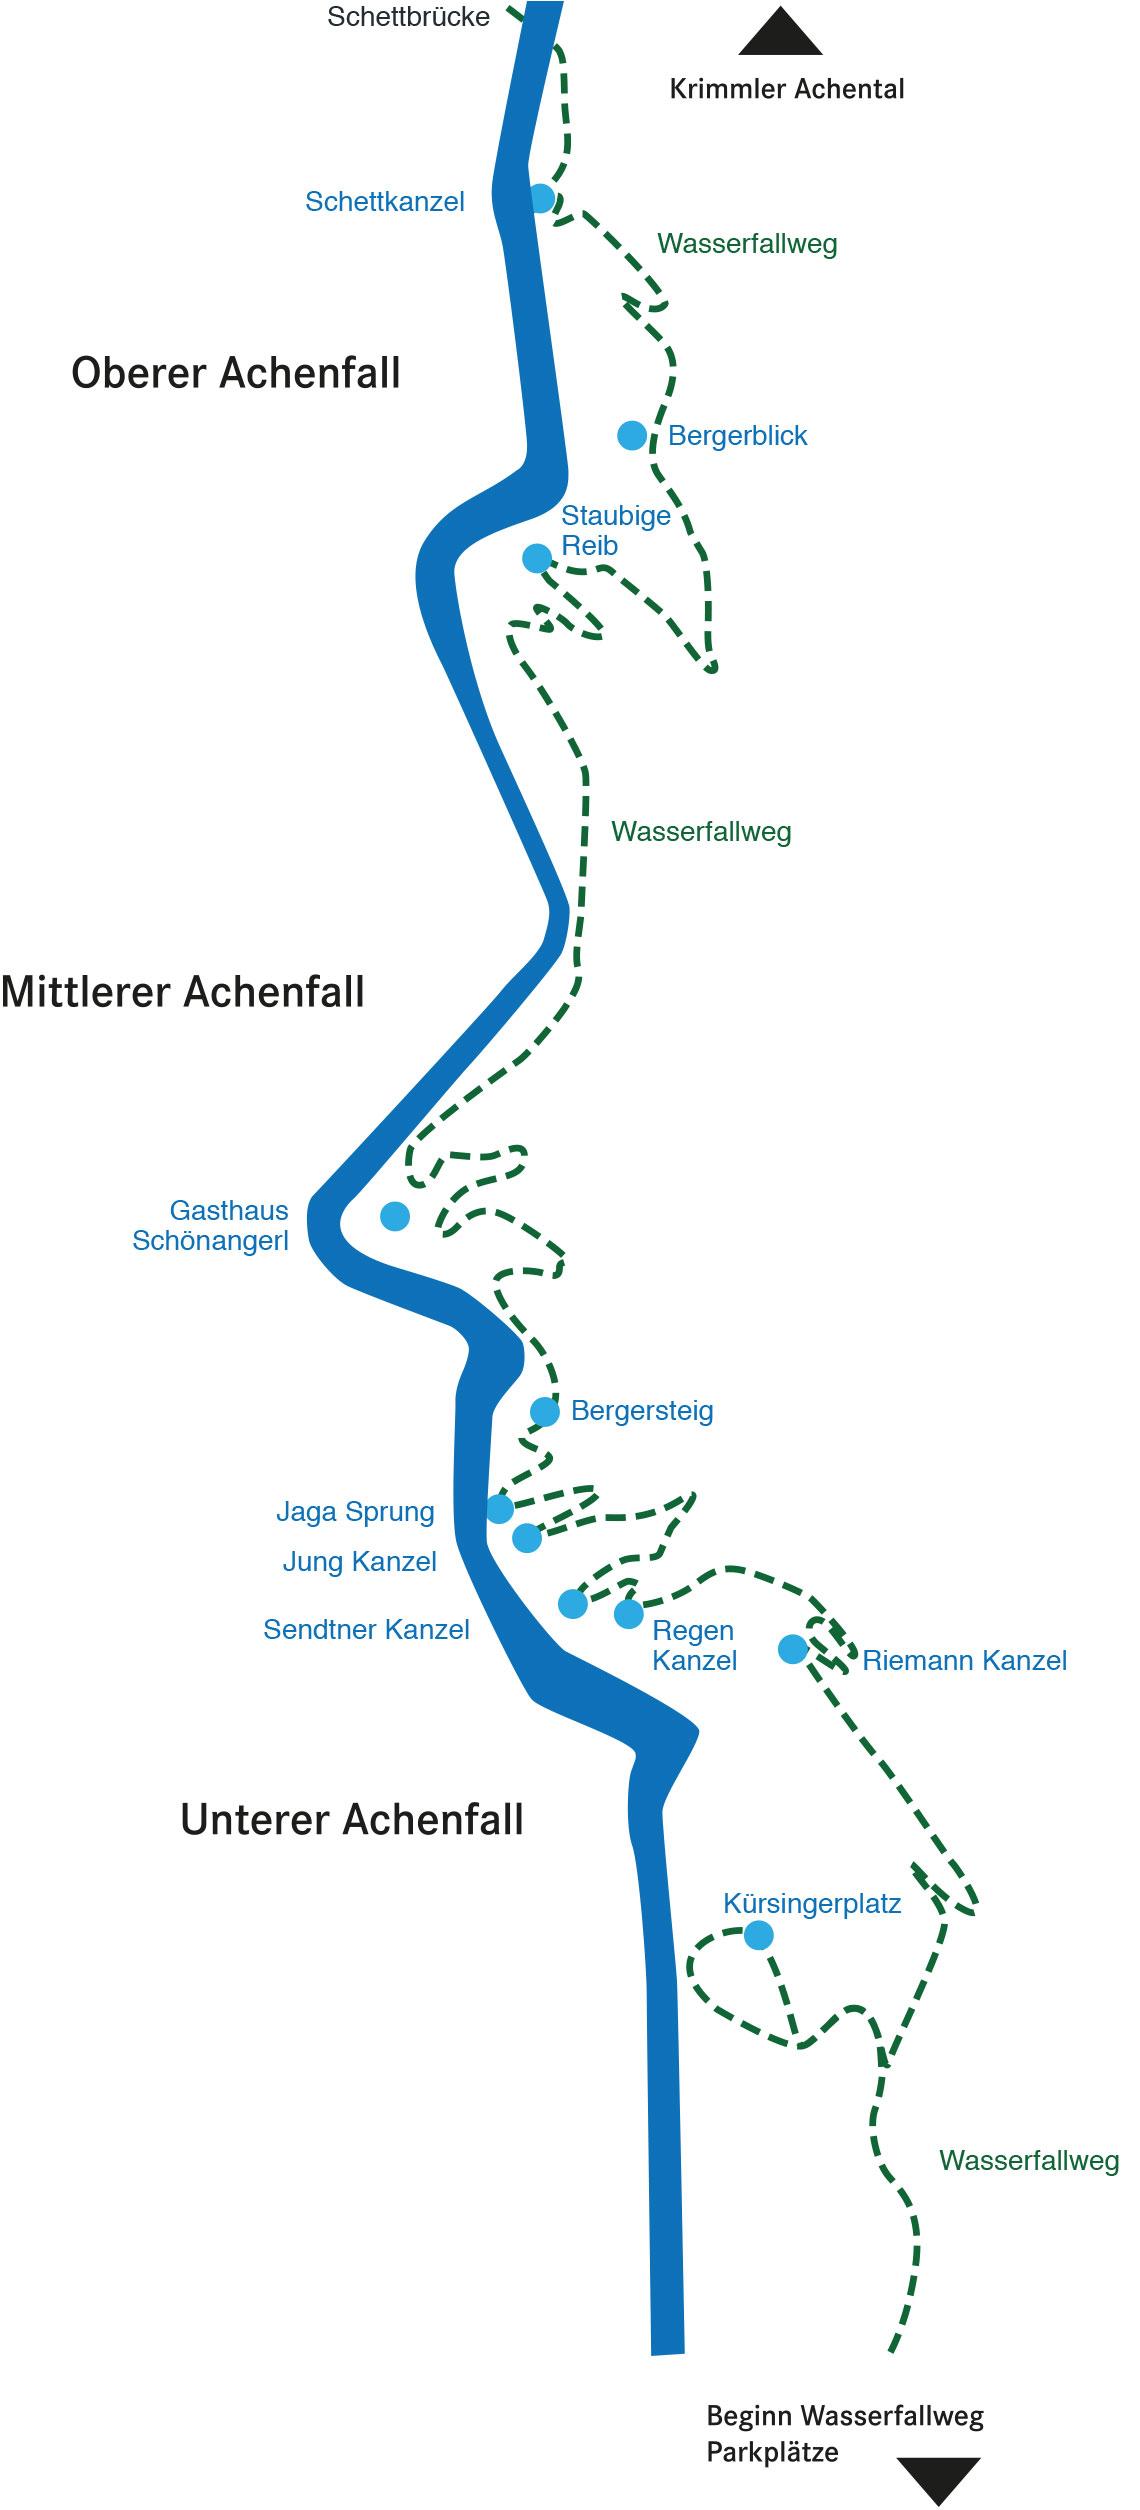 The waterfall path